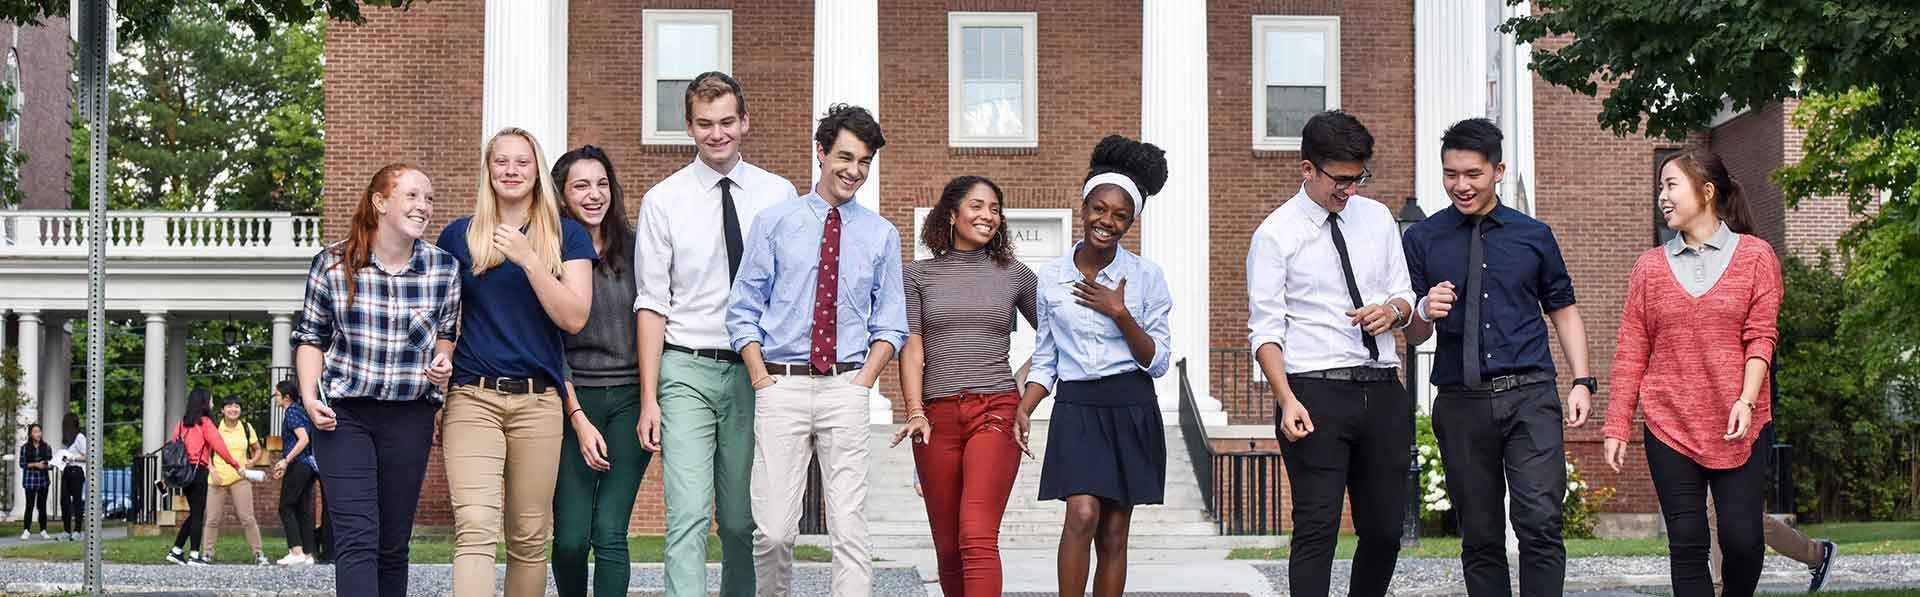 St-Johnsbury-Academy-VT-Students-Campus-Banner-2019